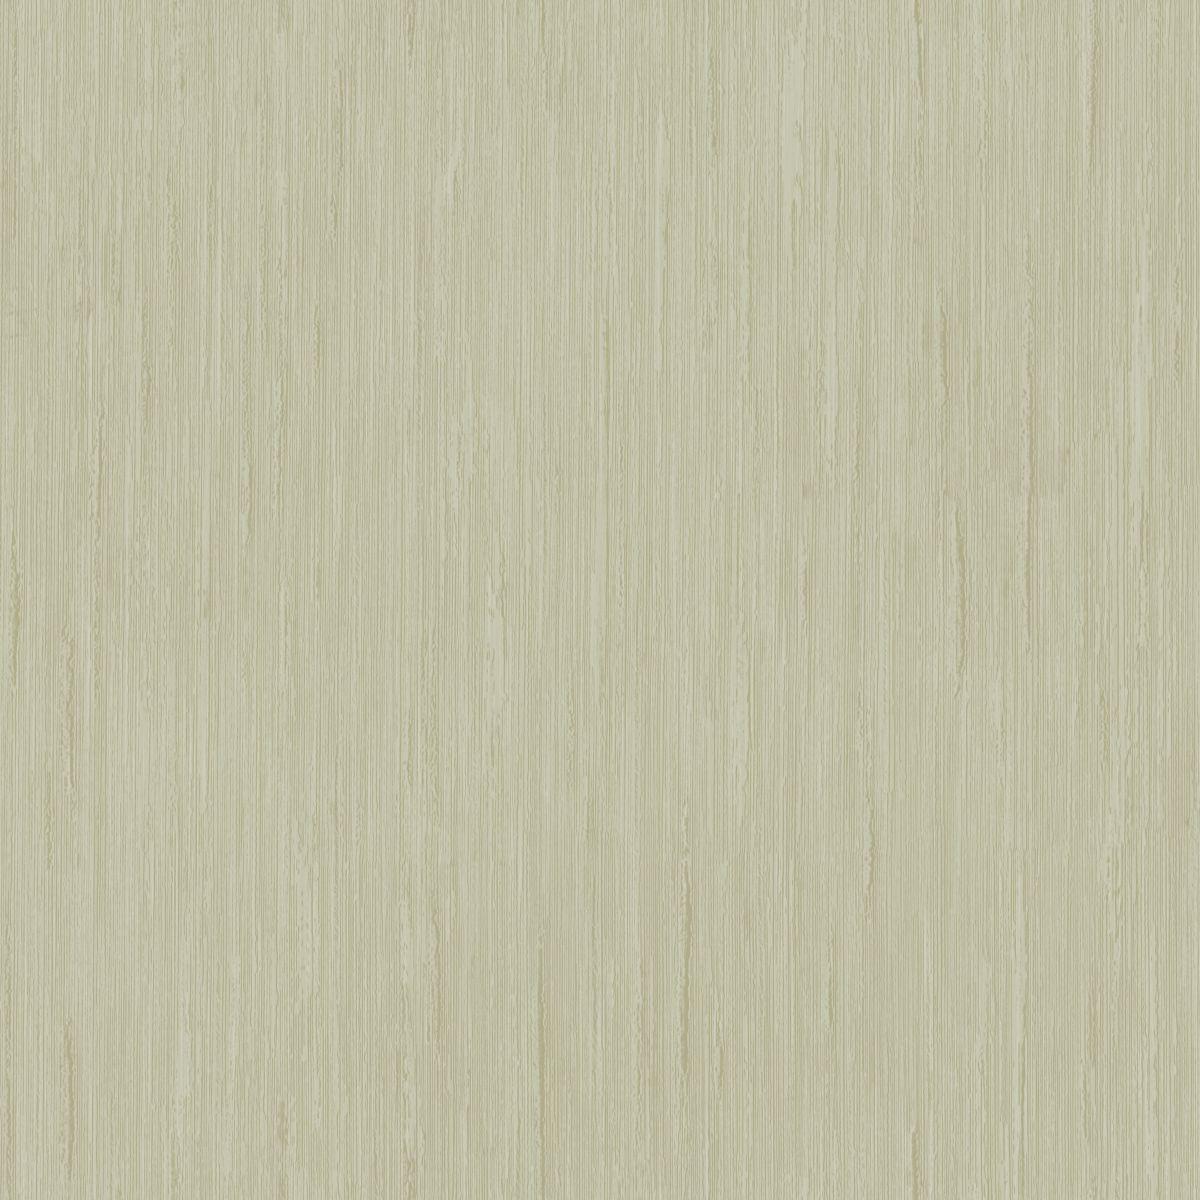 hochwertige tapeten und stoffe vinyltapete parato cristina masi vintage 3985 decowunder. Black Bedroom Furniture Sets. Home Design Ideas